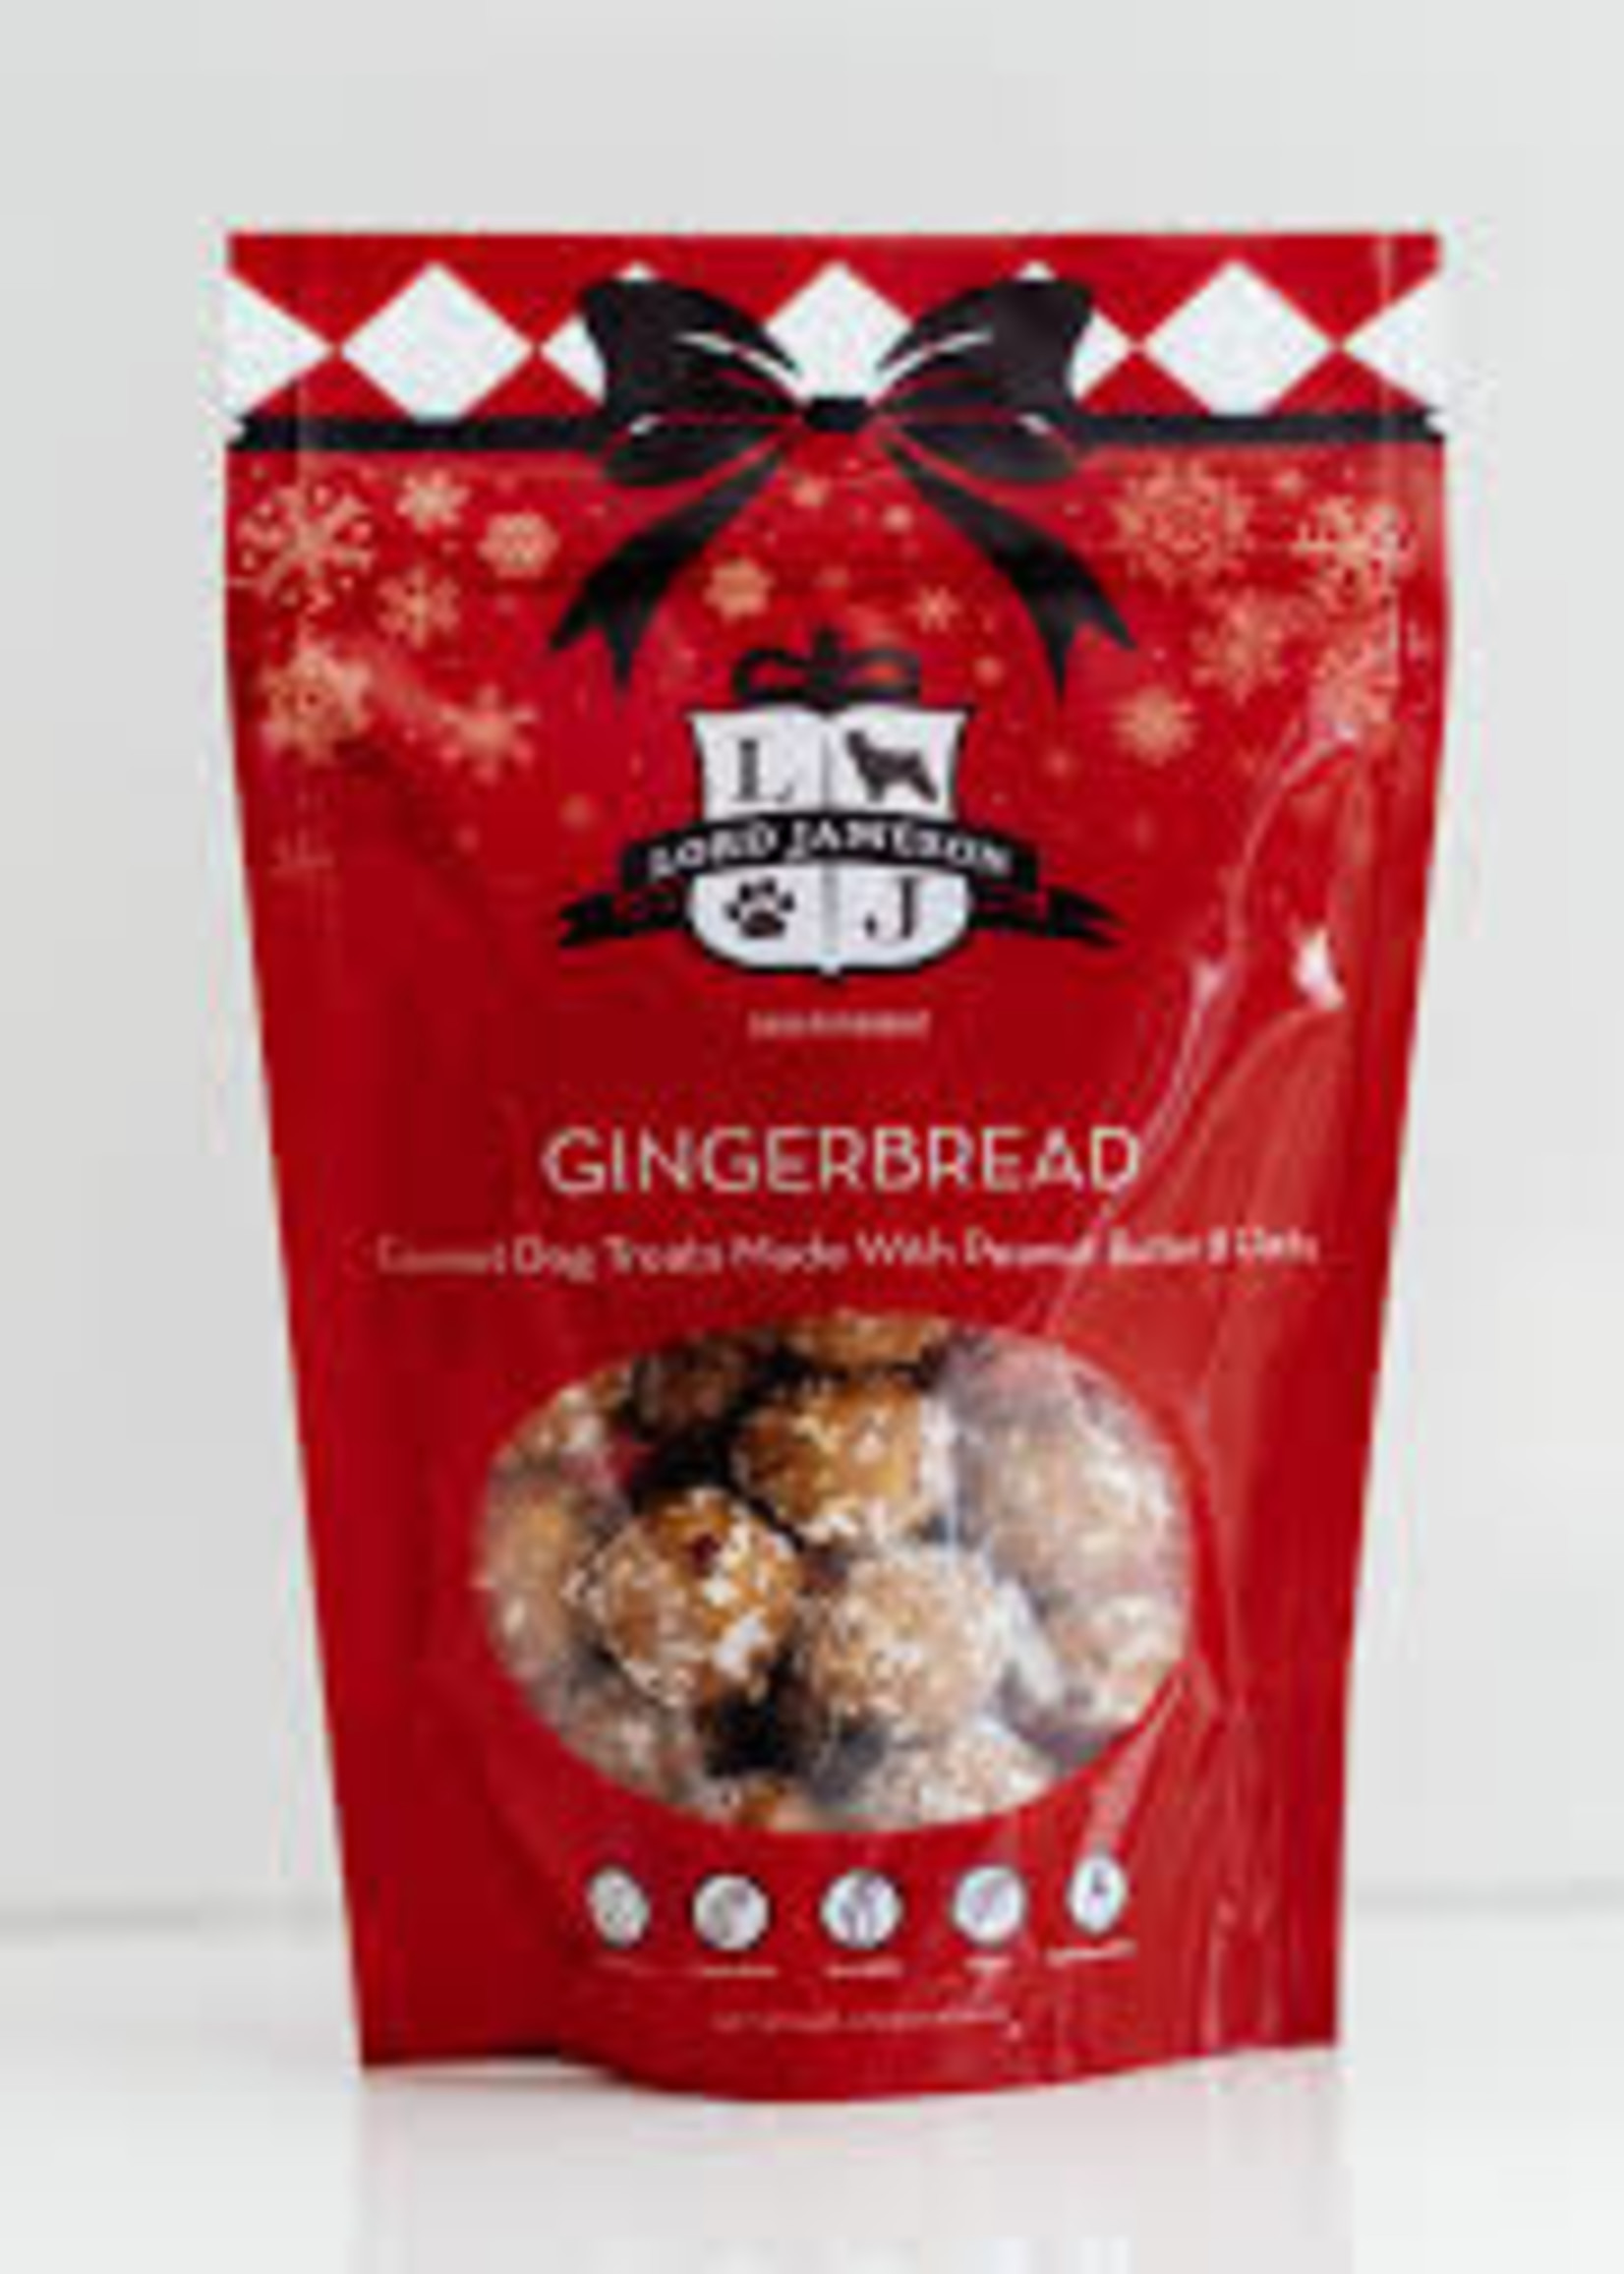 Lord Jameson Lord Jameson Dog Treats Gingerbread 6oz